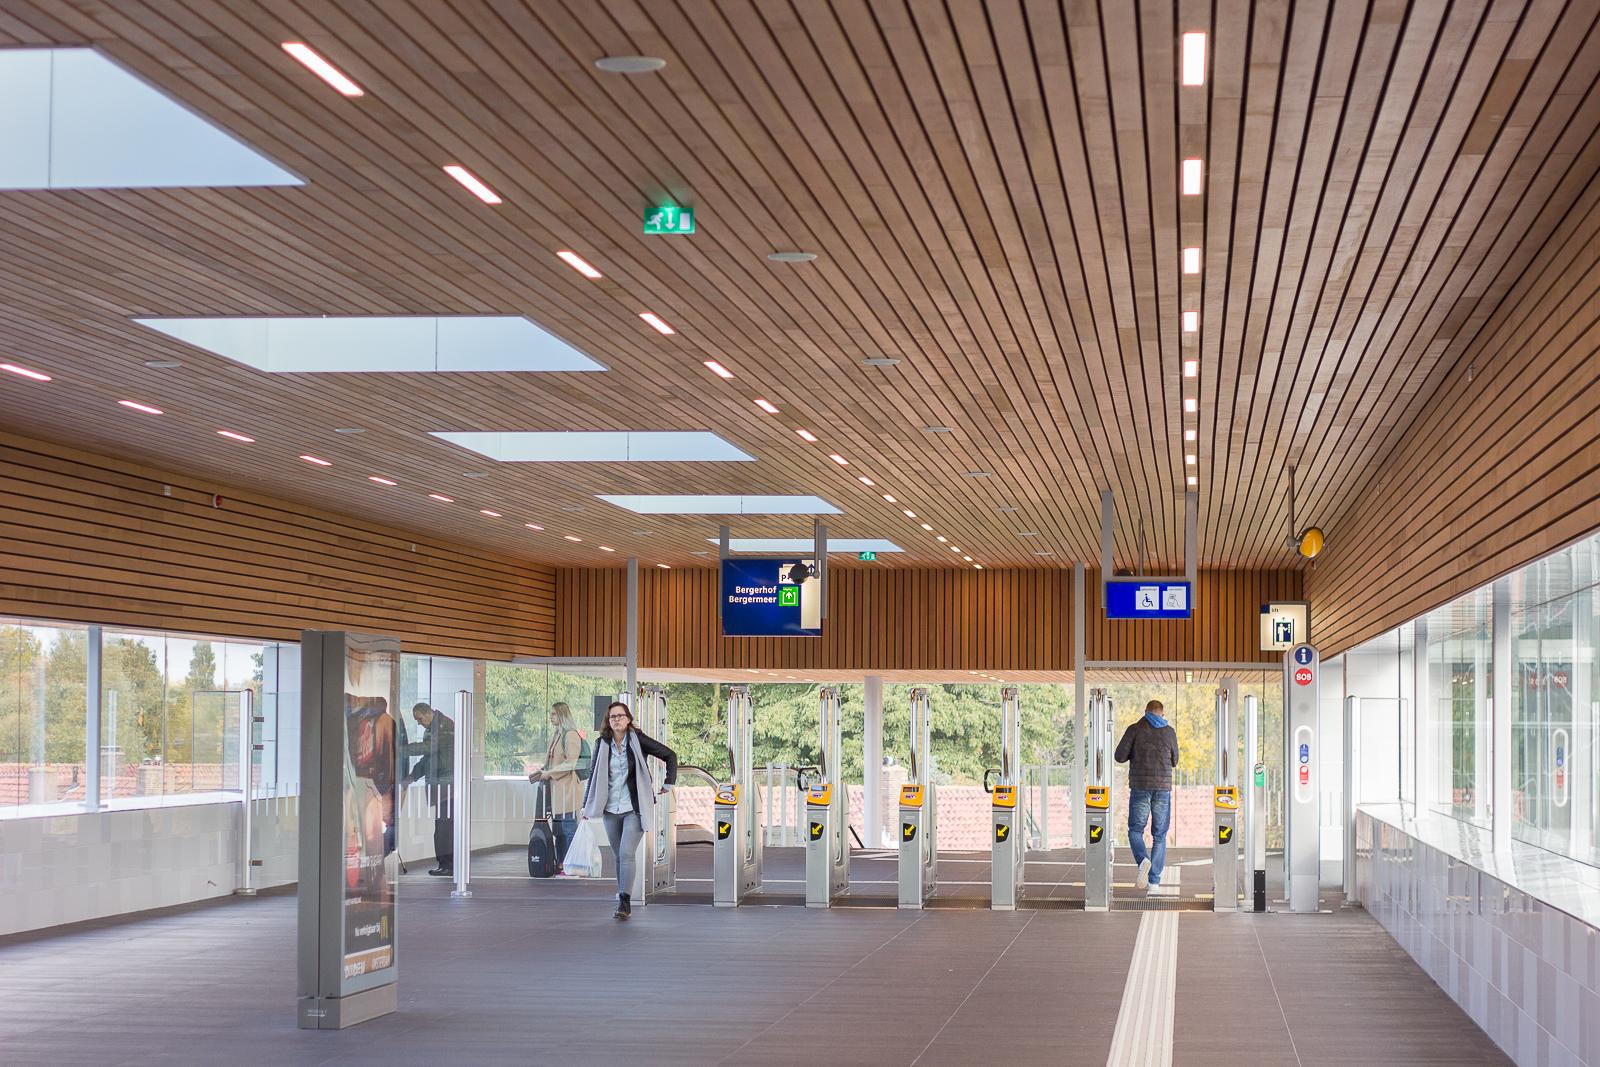 station_alkmaar_10